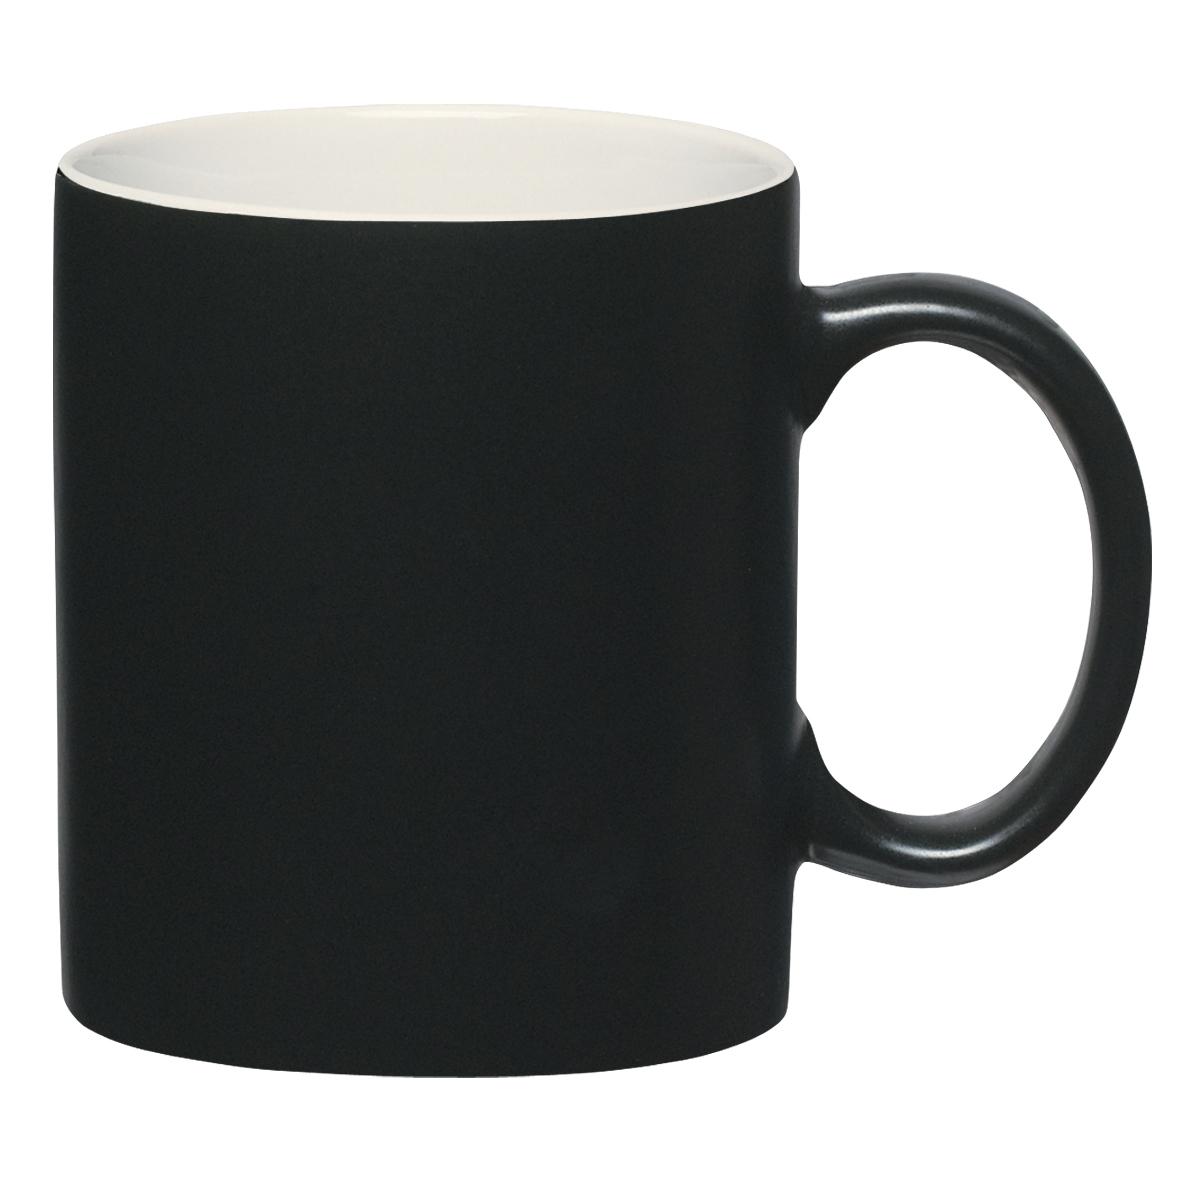 Cosmic Black Ceramic Mug, 11oz.